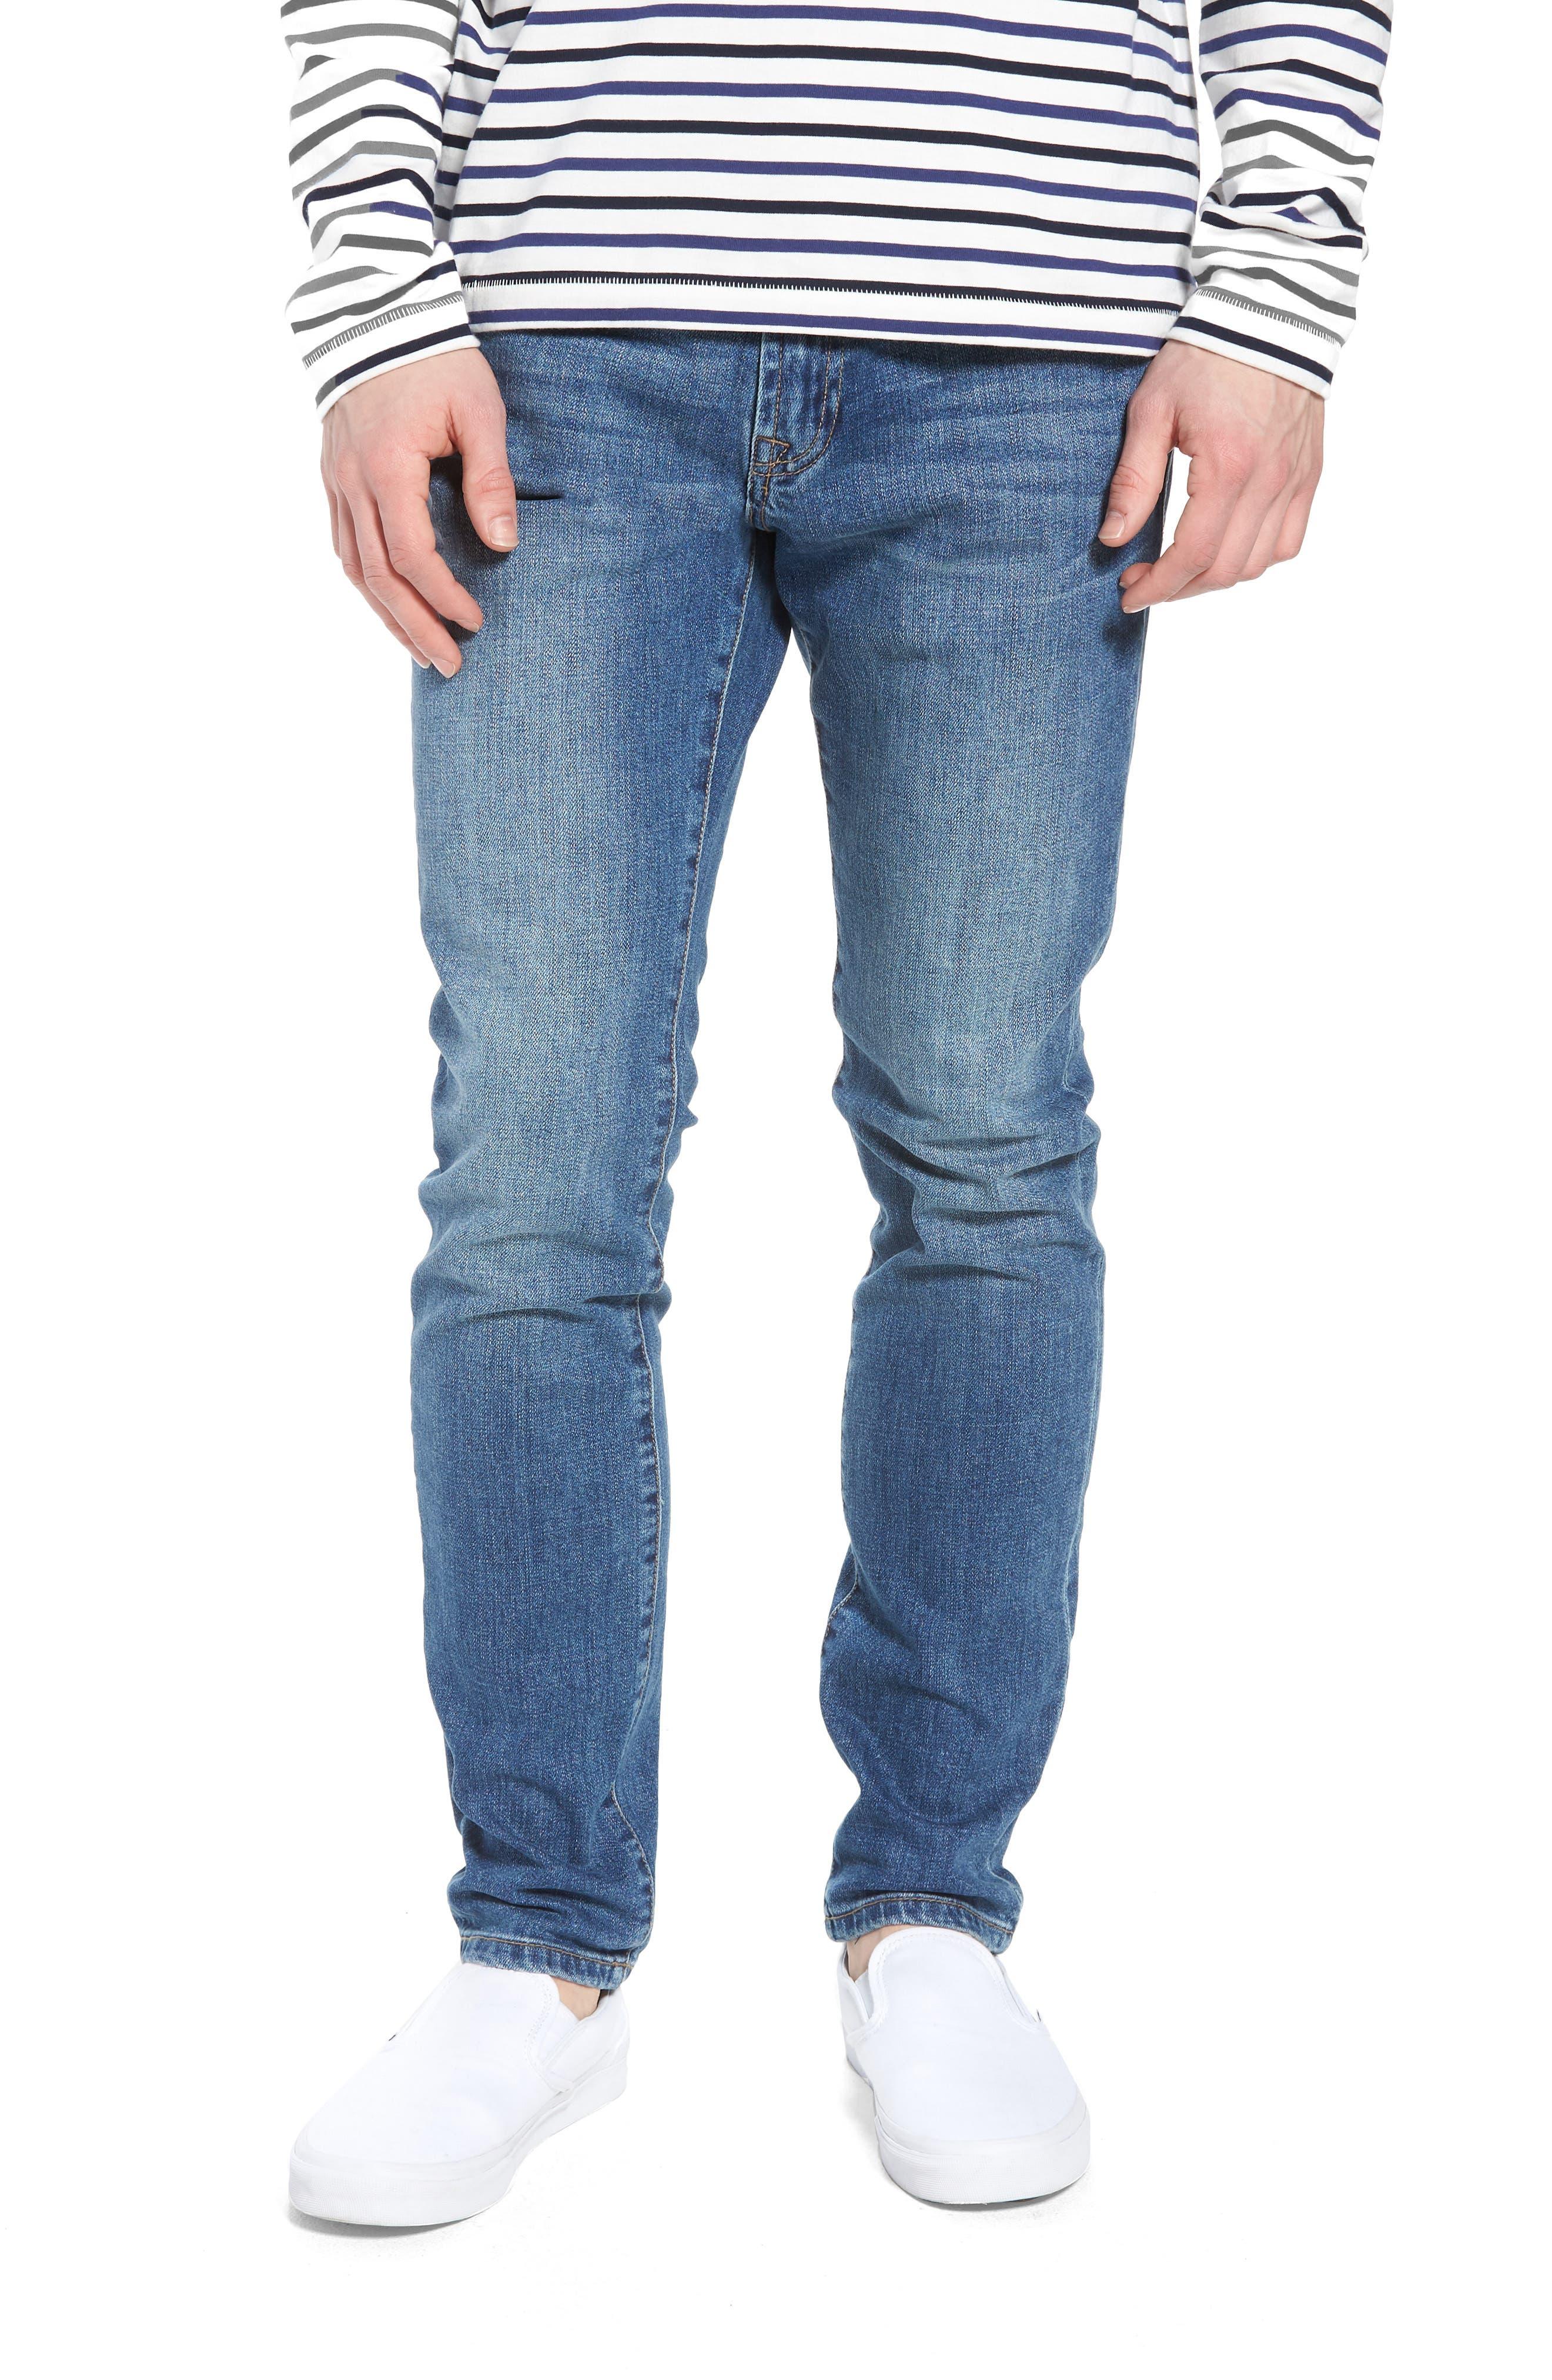 Jeans Co. Bond Skinny Fit Jeans,                             Main thumbnail 1, color,                             Bryson Vintage Medium